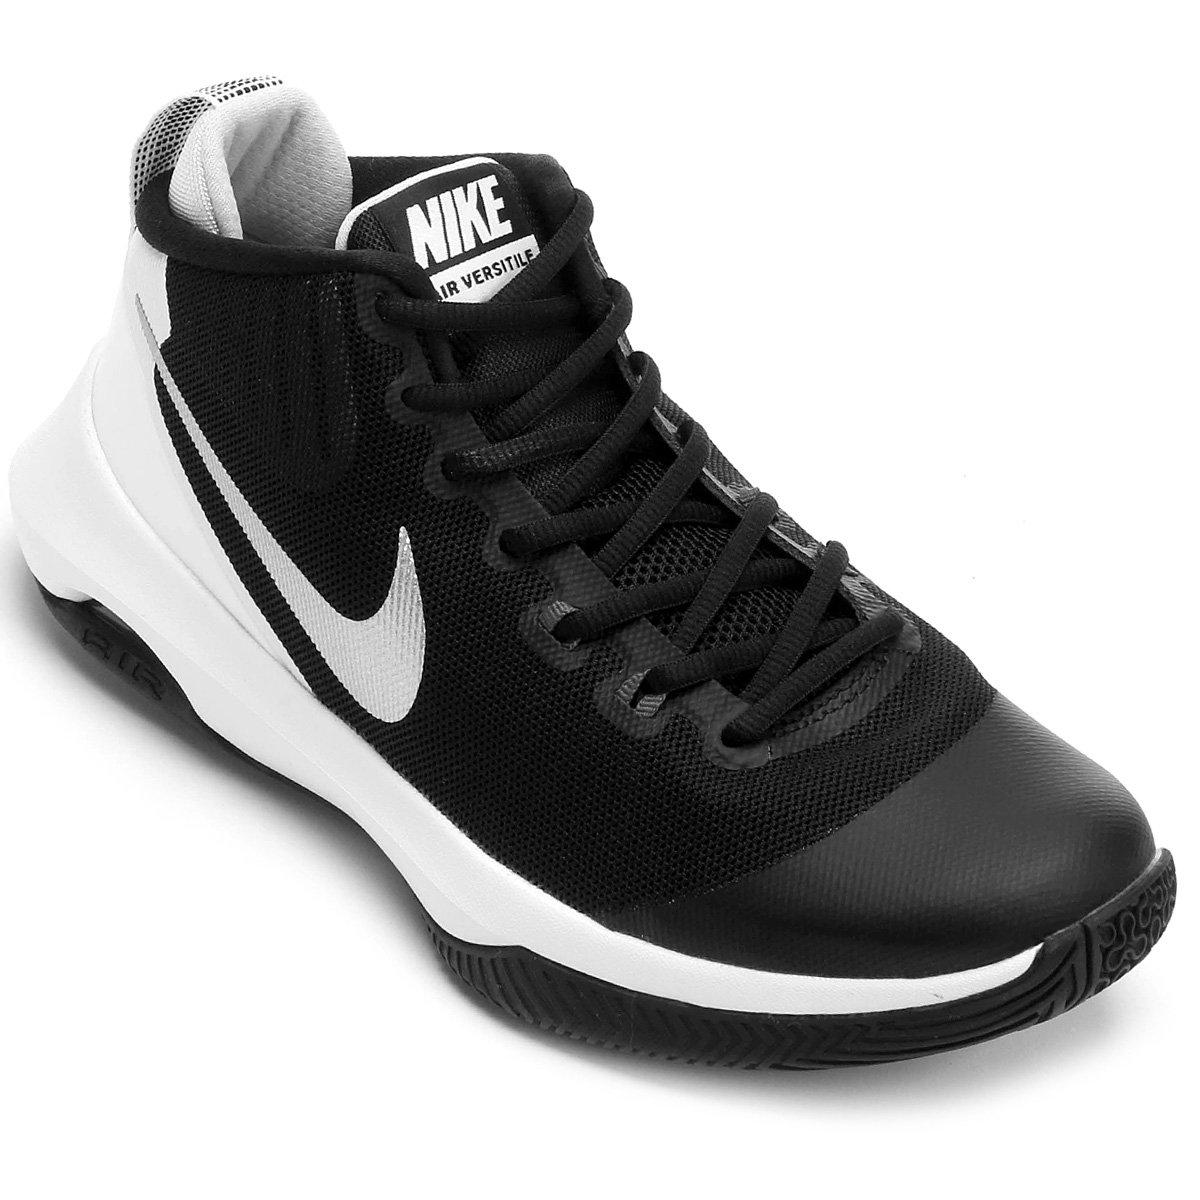 Tênis Nike Air Versitile Masculino - Preto e Cinza - Compre Agora ... 54bbdb82d94cd